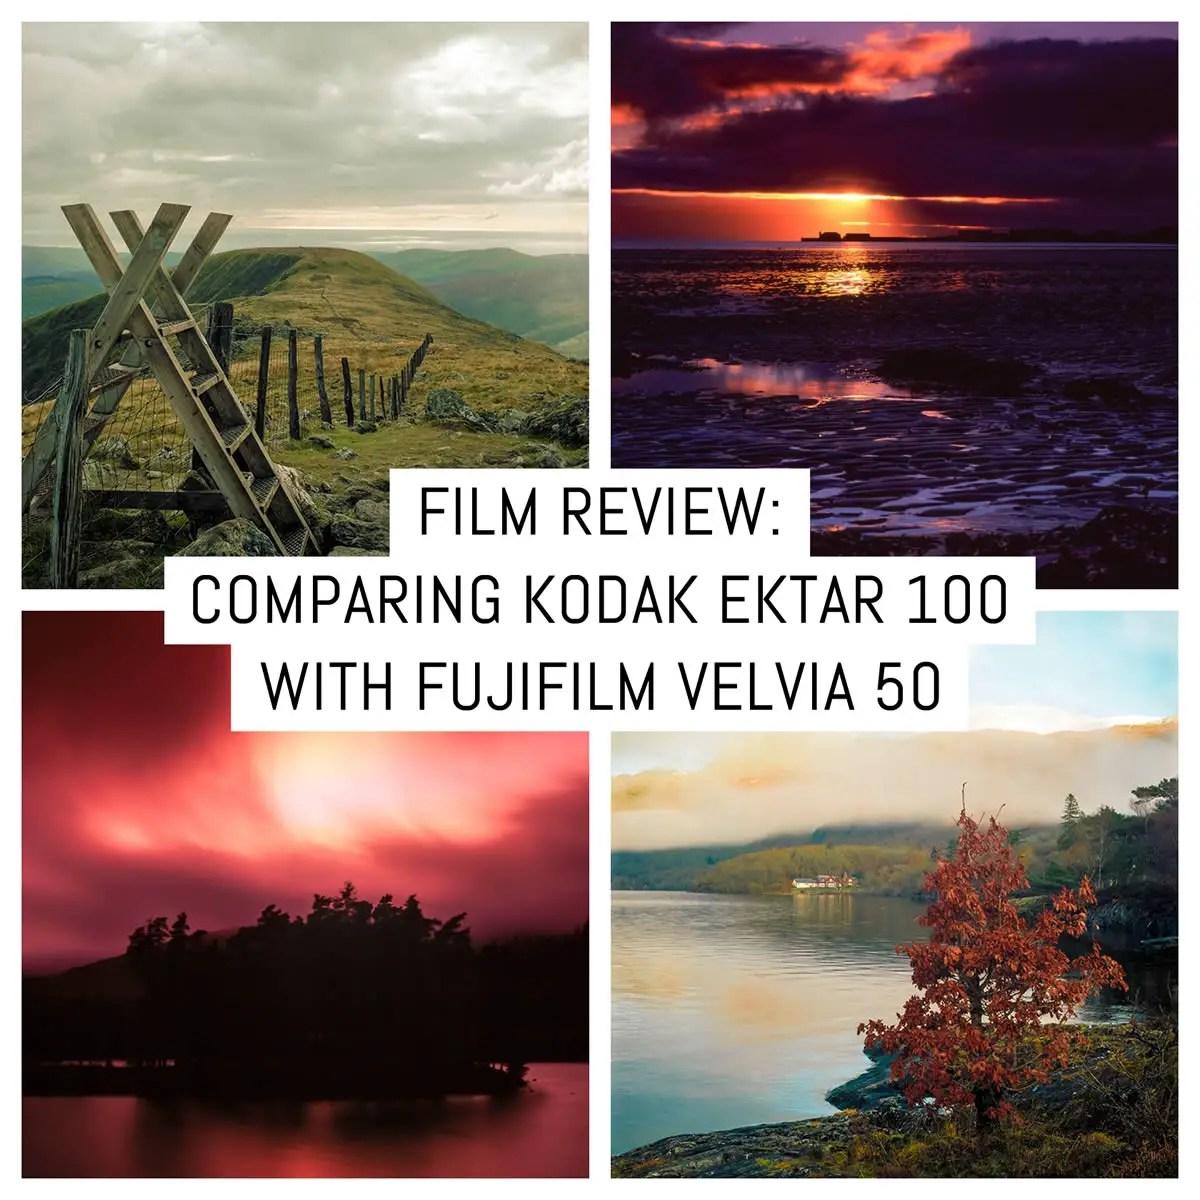 Film stock review: Comparing Kodak Ektar 100 to Fujifilm Velvia 50